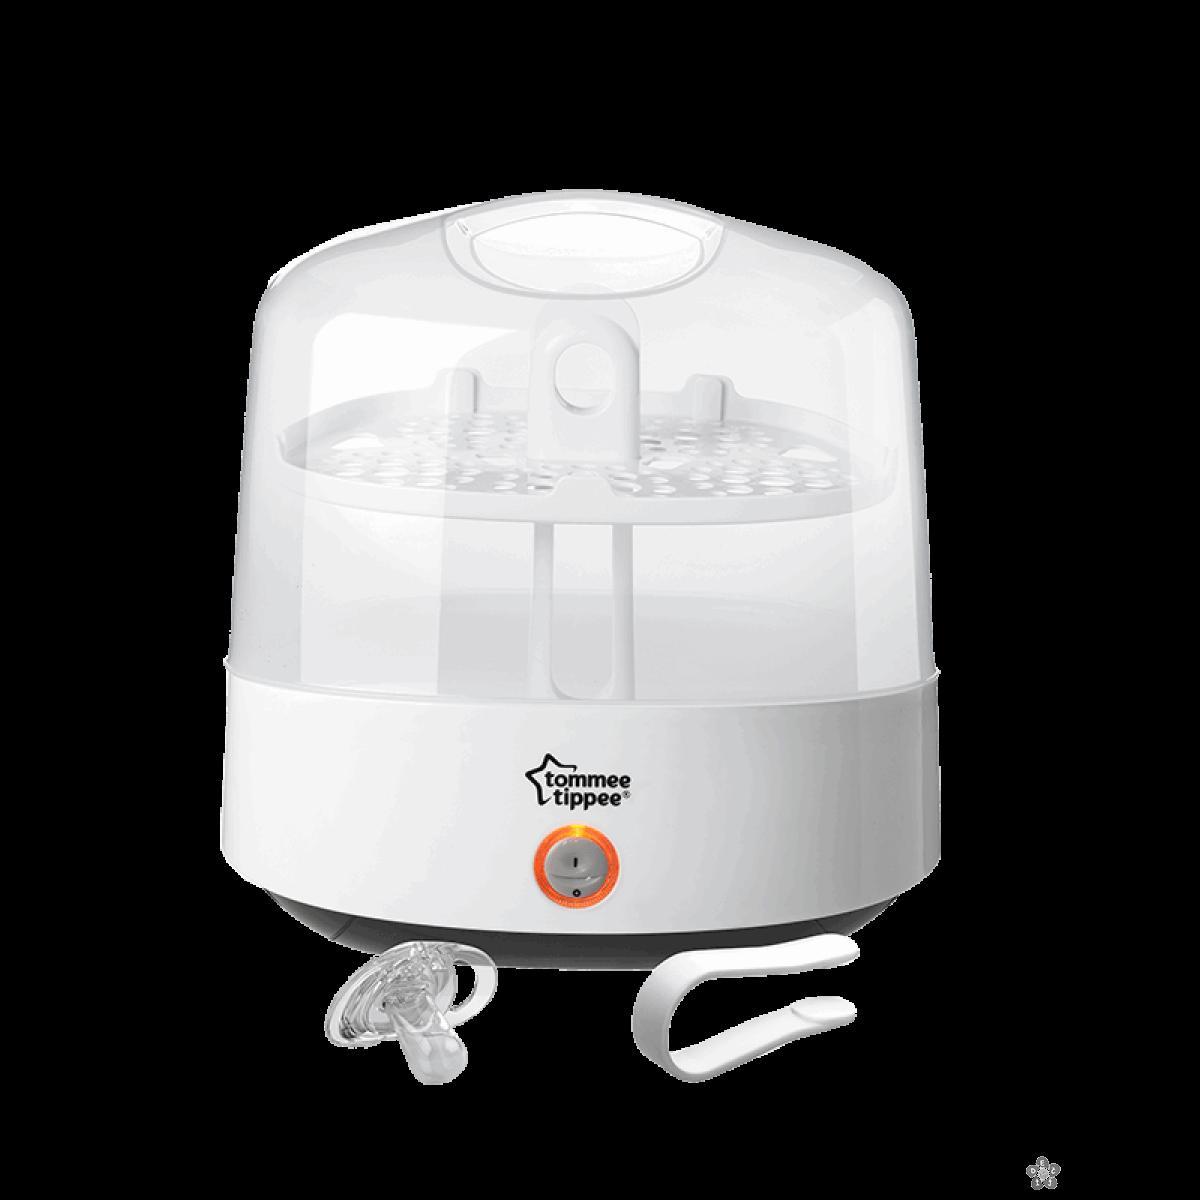 Električni sterilizator Tommee Tippee, 117068